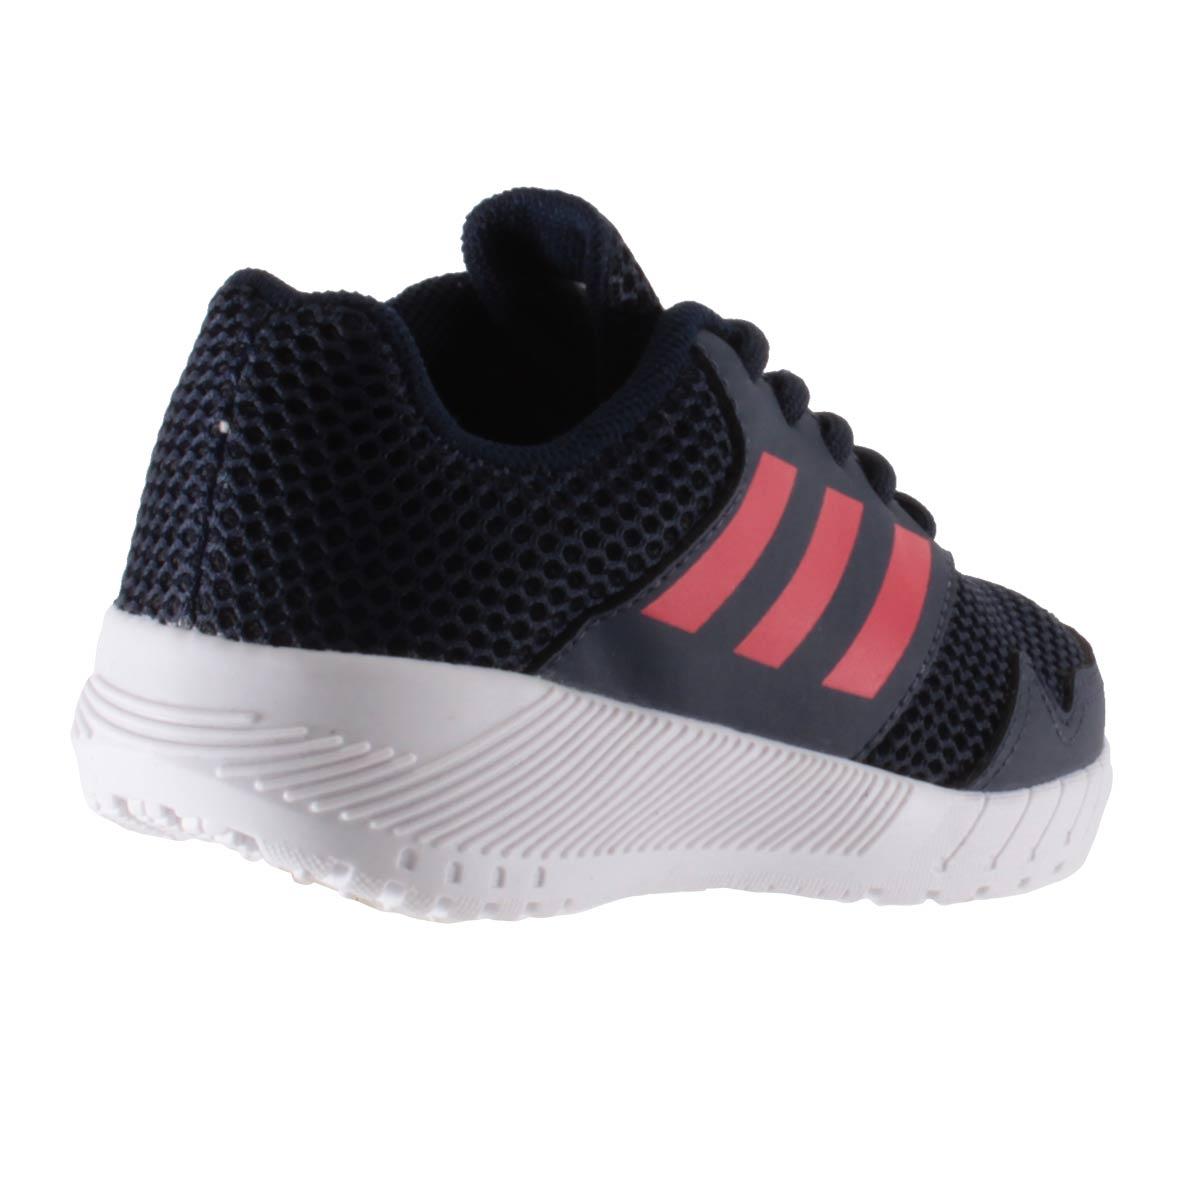 Tênis Adidas QuickRun K Infantil Menino